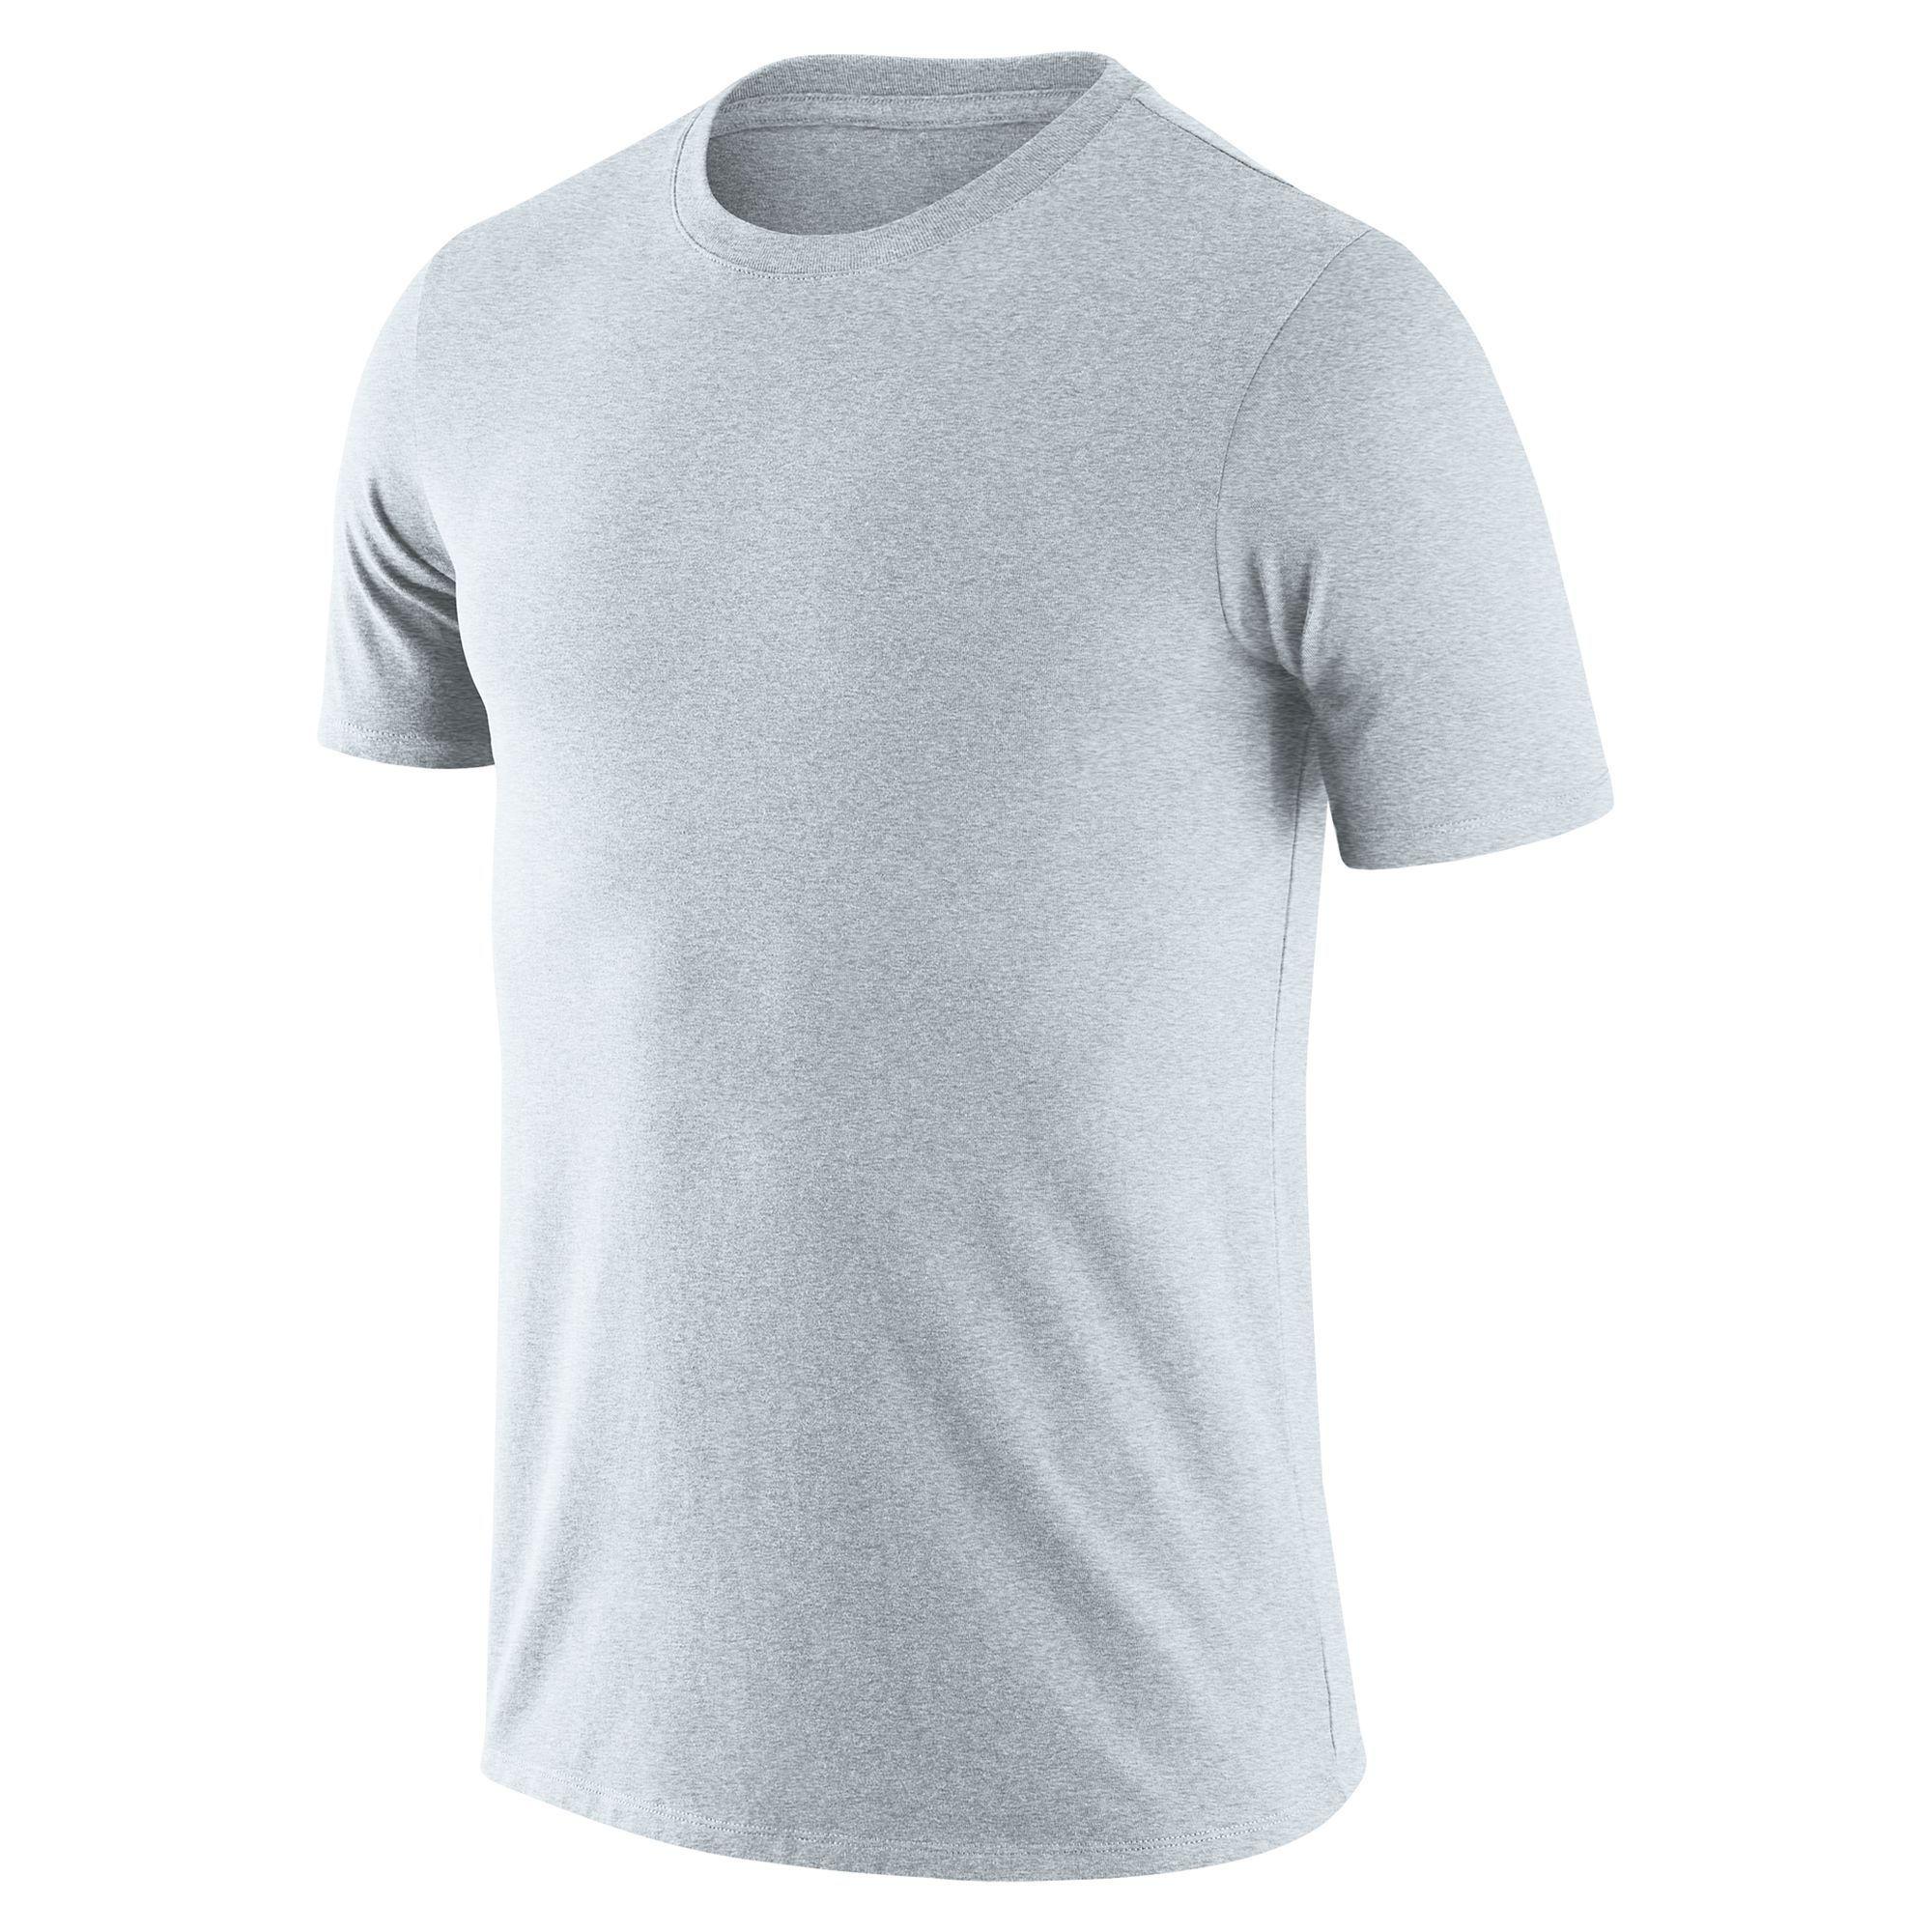 ade9c42a51a Big And Tall T Shirts Nike | Azərbaycan Dillər Universiteti